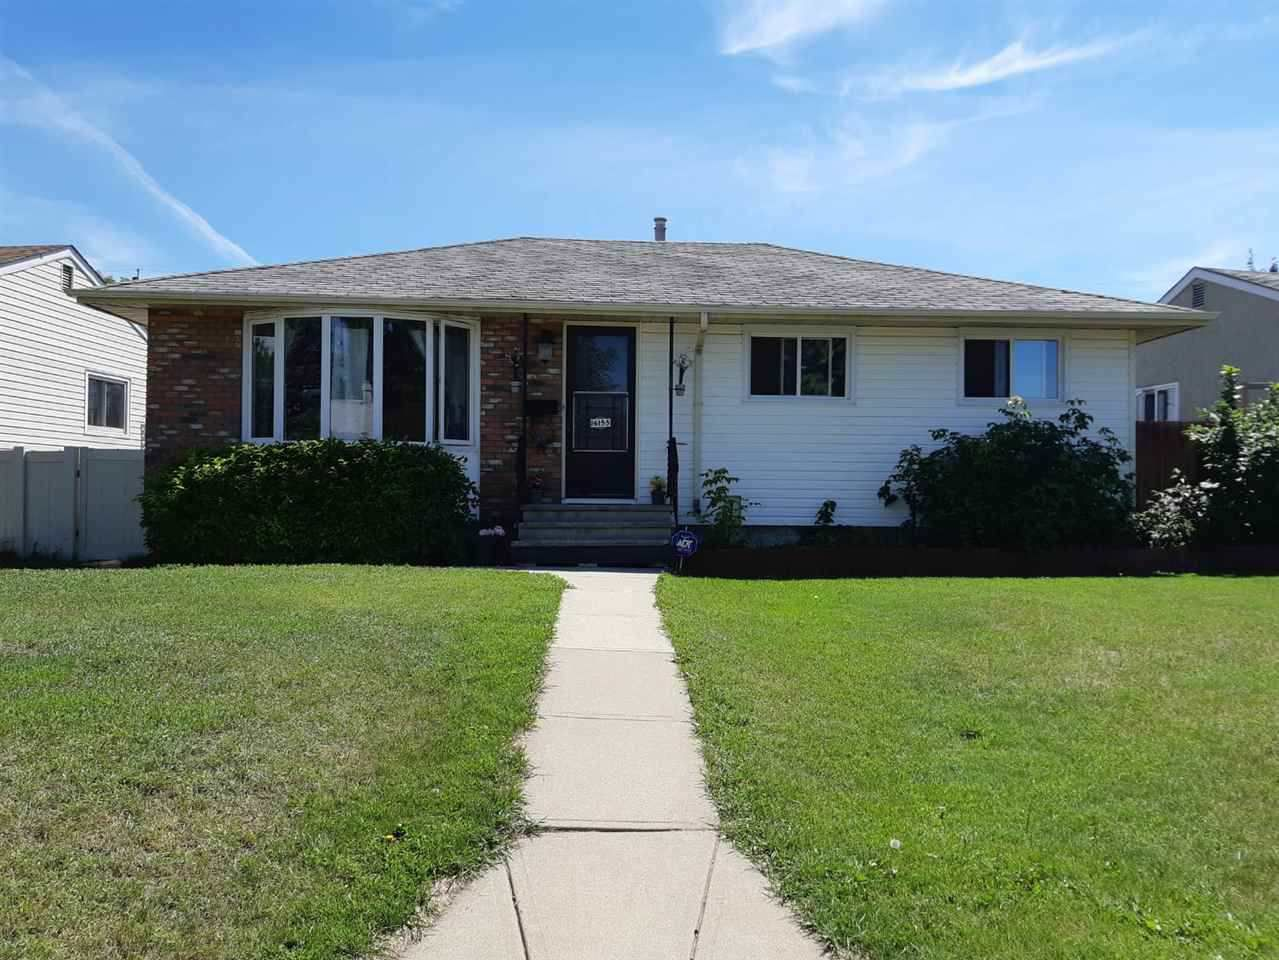 Main Photo: 16155 110B Avenue in Edmonton: Zone 21 House for sale : MLS®# E4148323